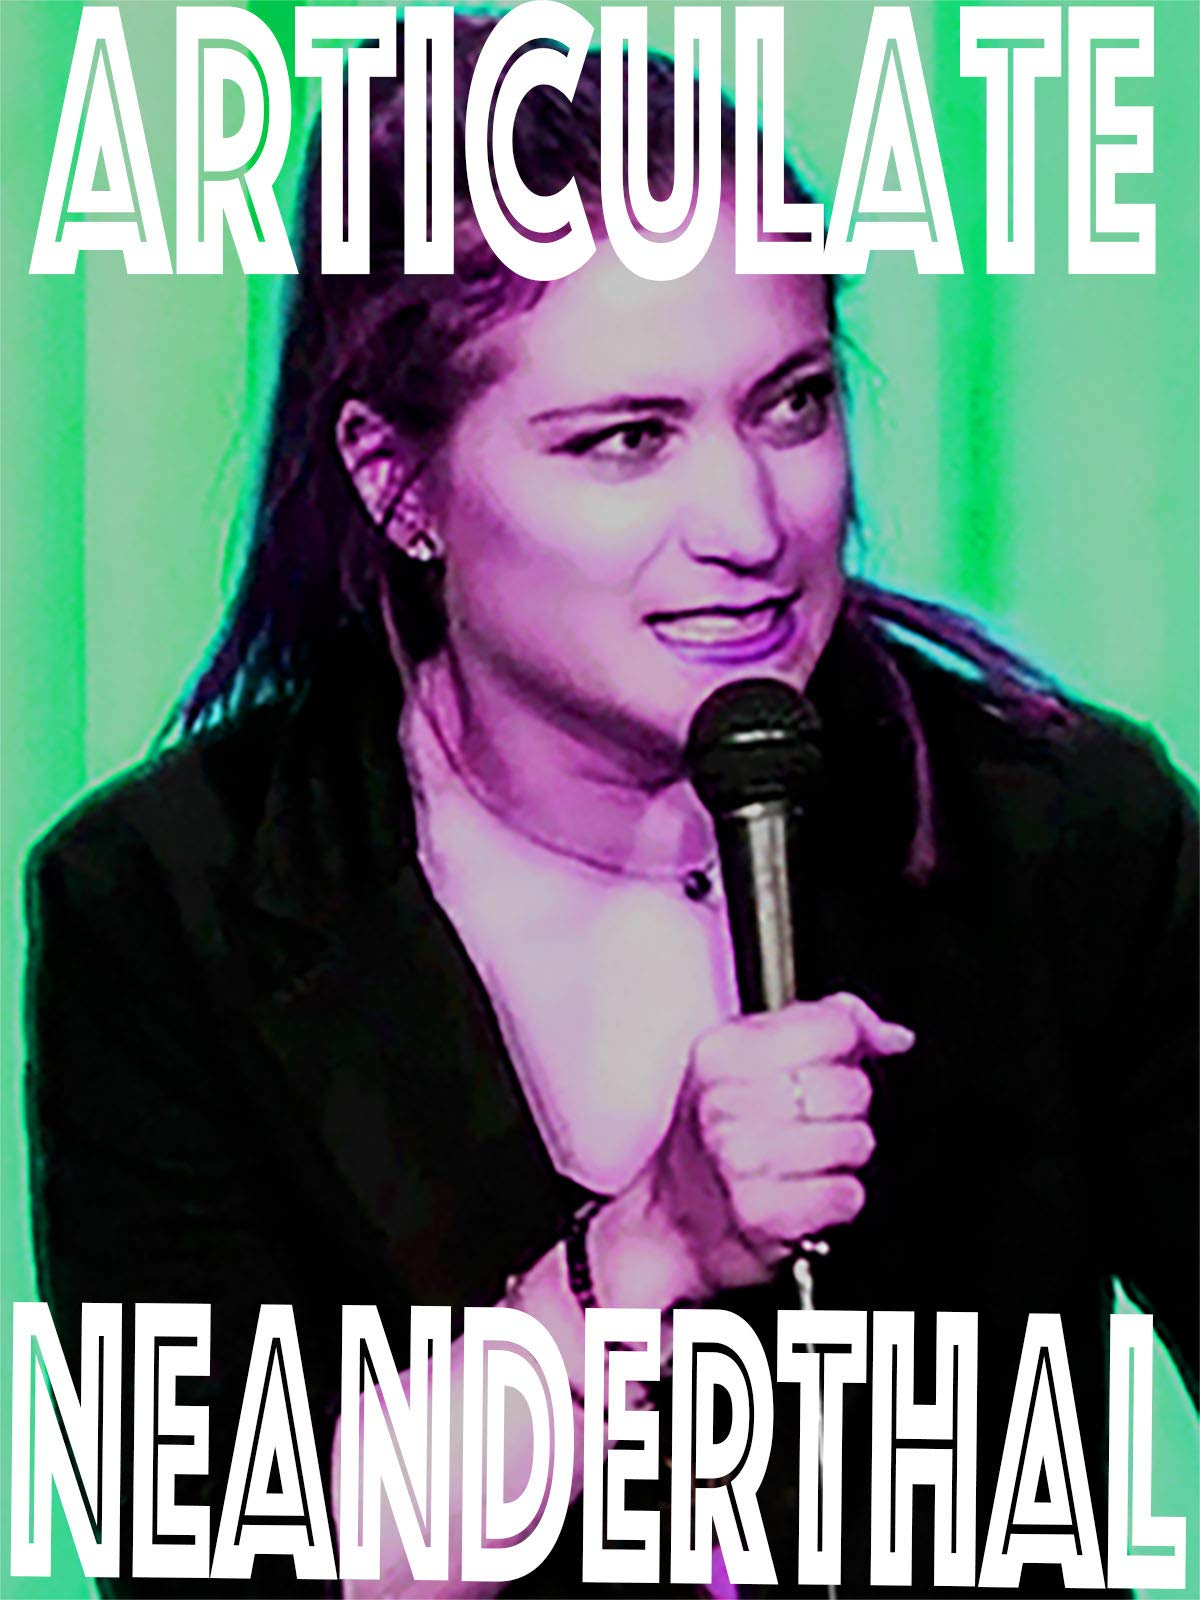 Articulate Neanderthal